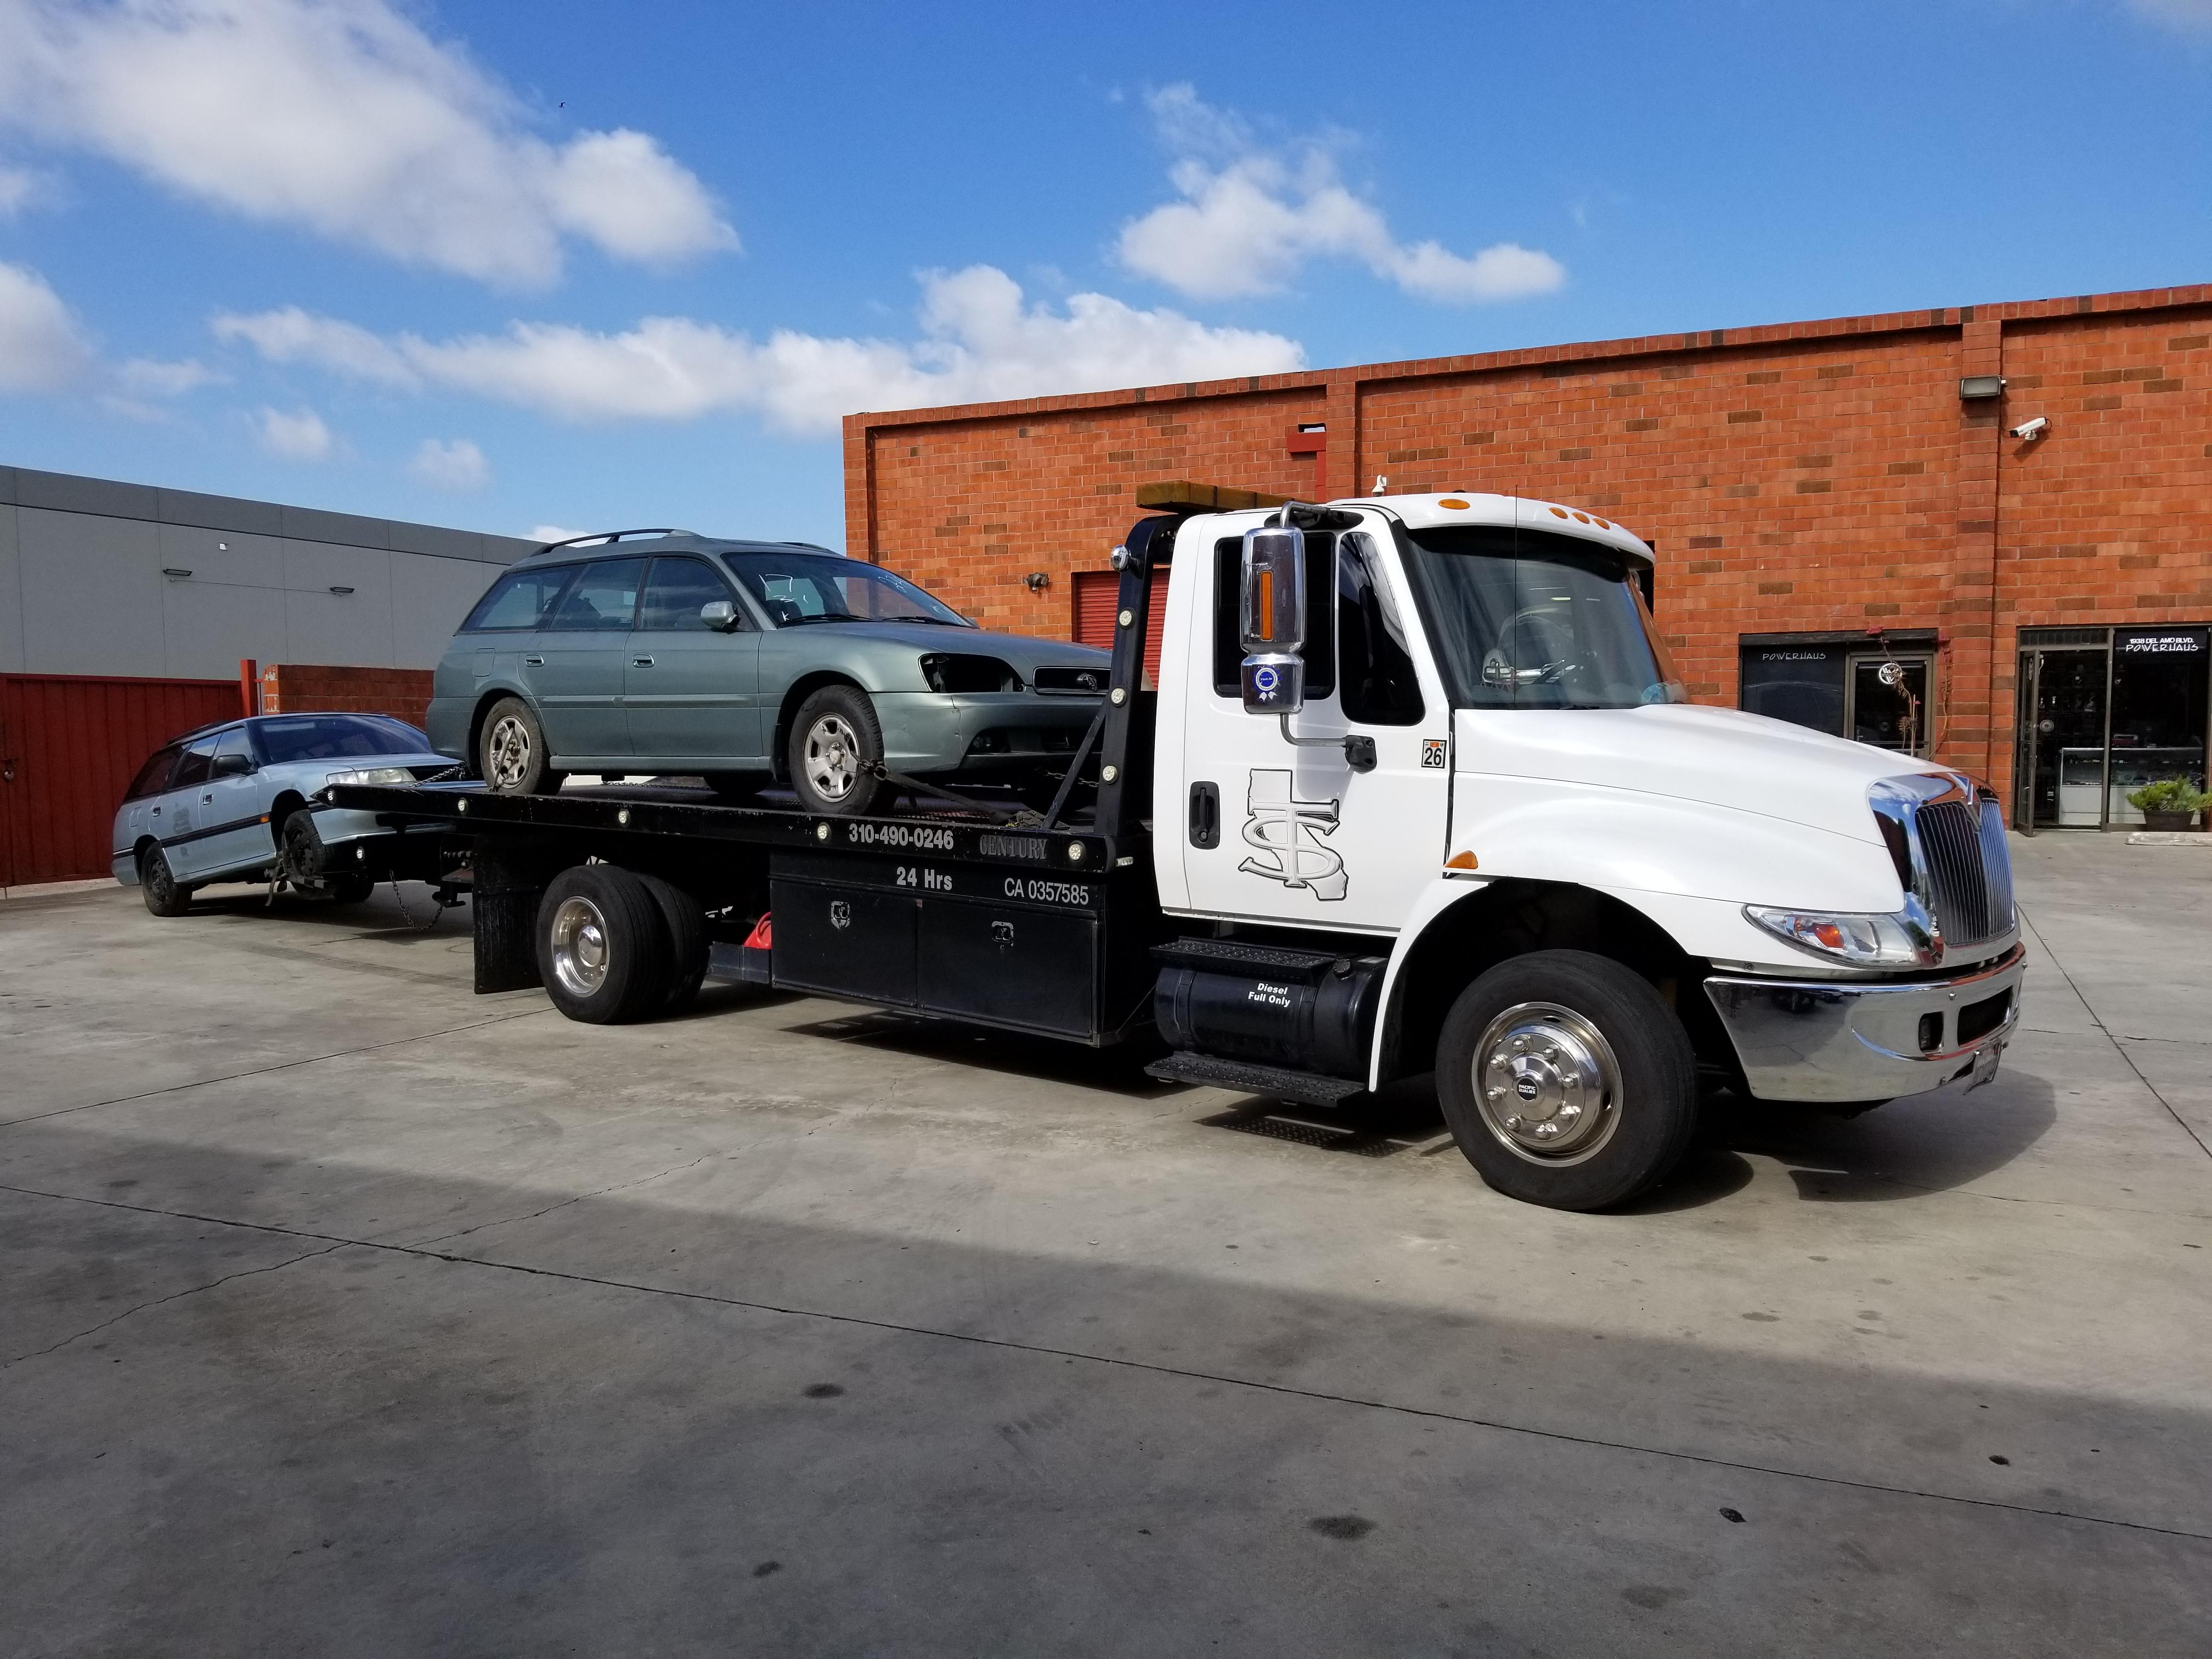 Segura's Towing Service